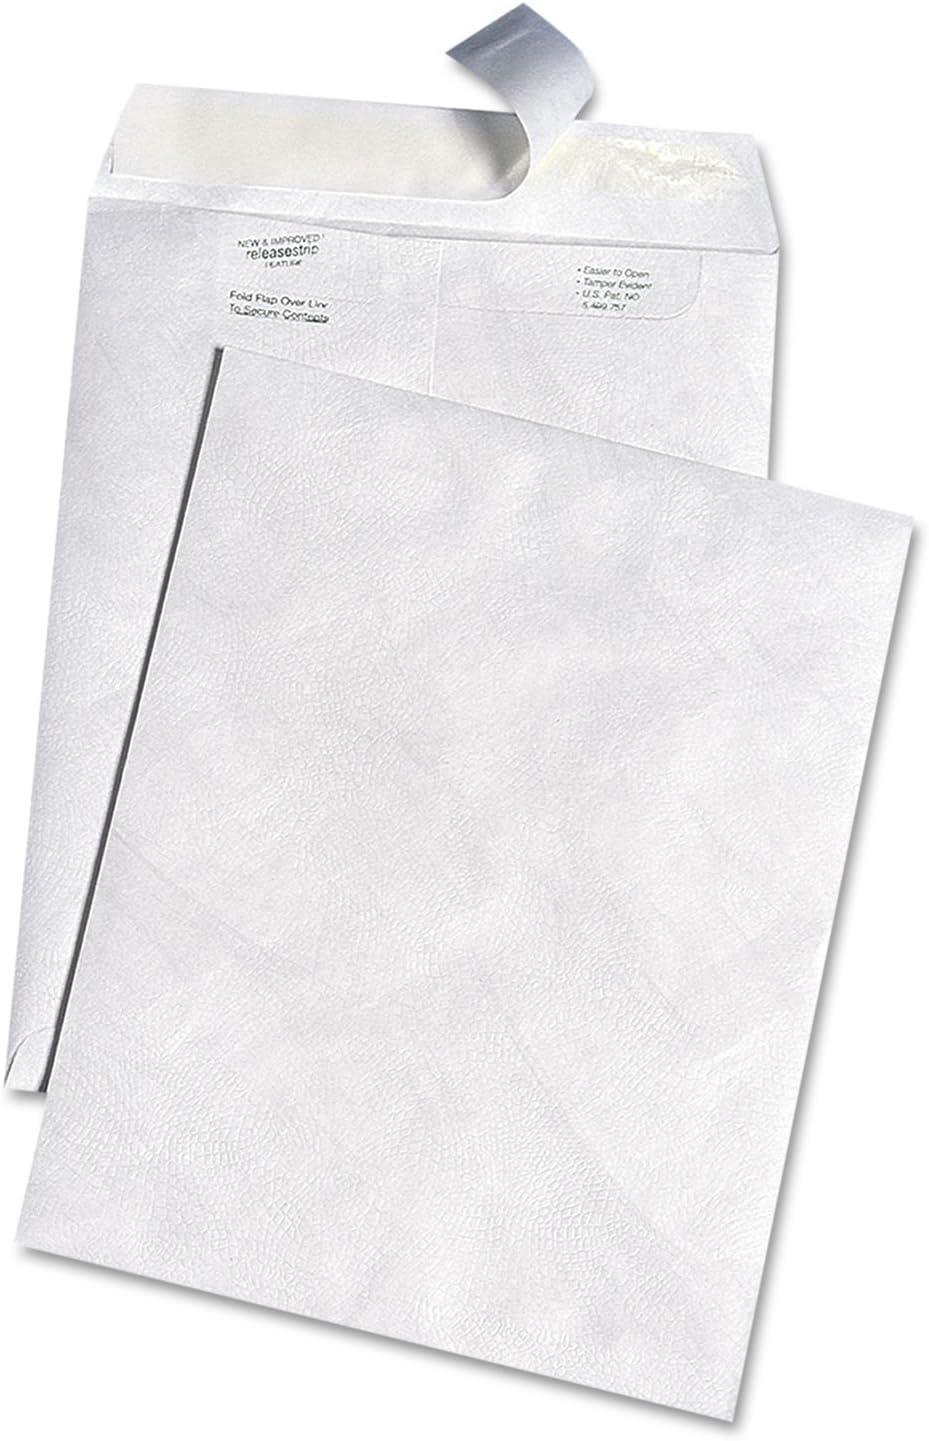 Survivor Max 75% OFF R3120 Tyvek Leather-Like Envelopes 9-Inch Plain x12-I Max 56% OFF